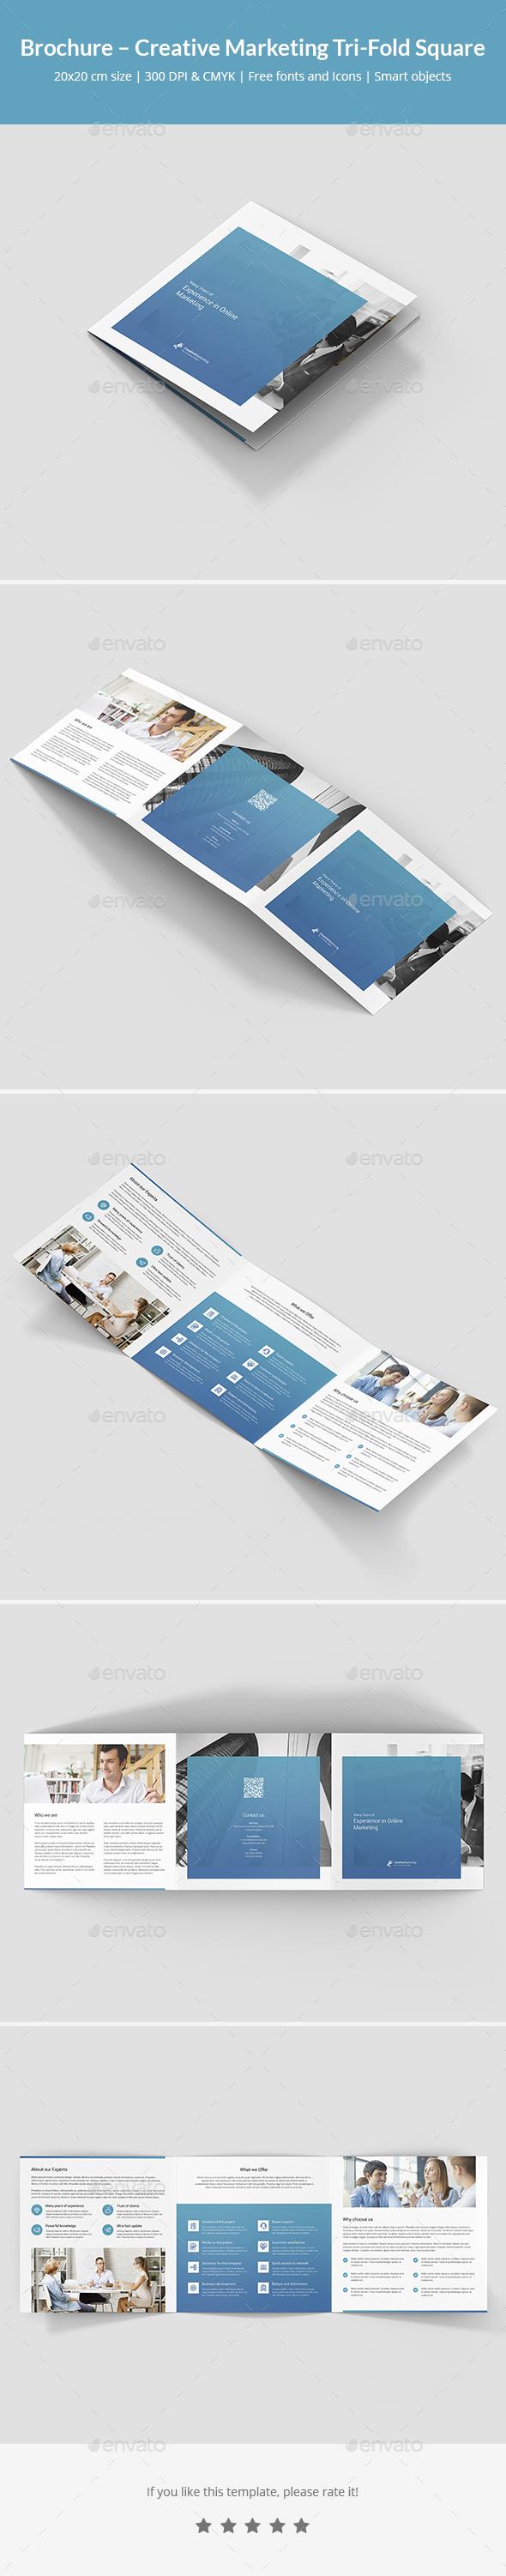 Brochure – Creative Marketing Tri-Fold Square - Corporate Brochures